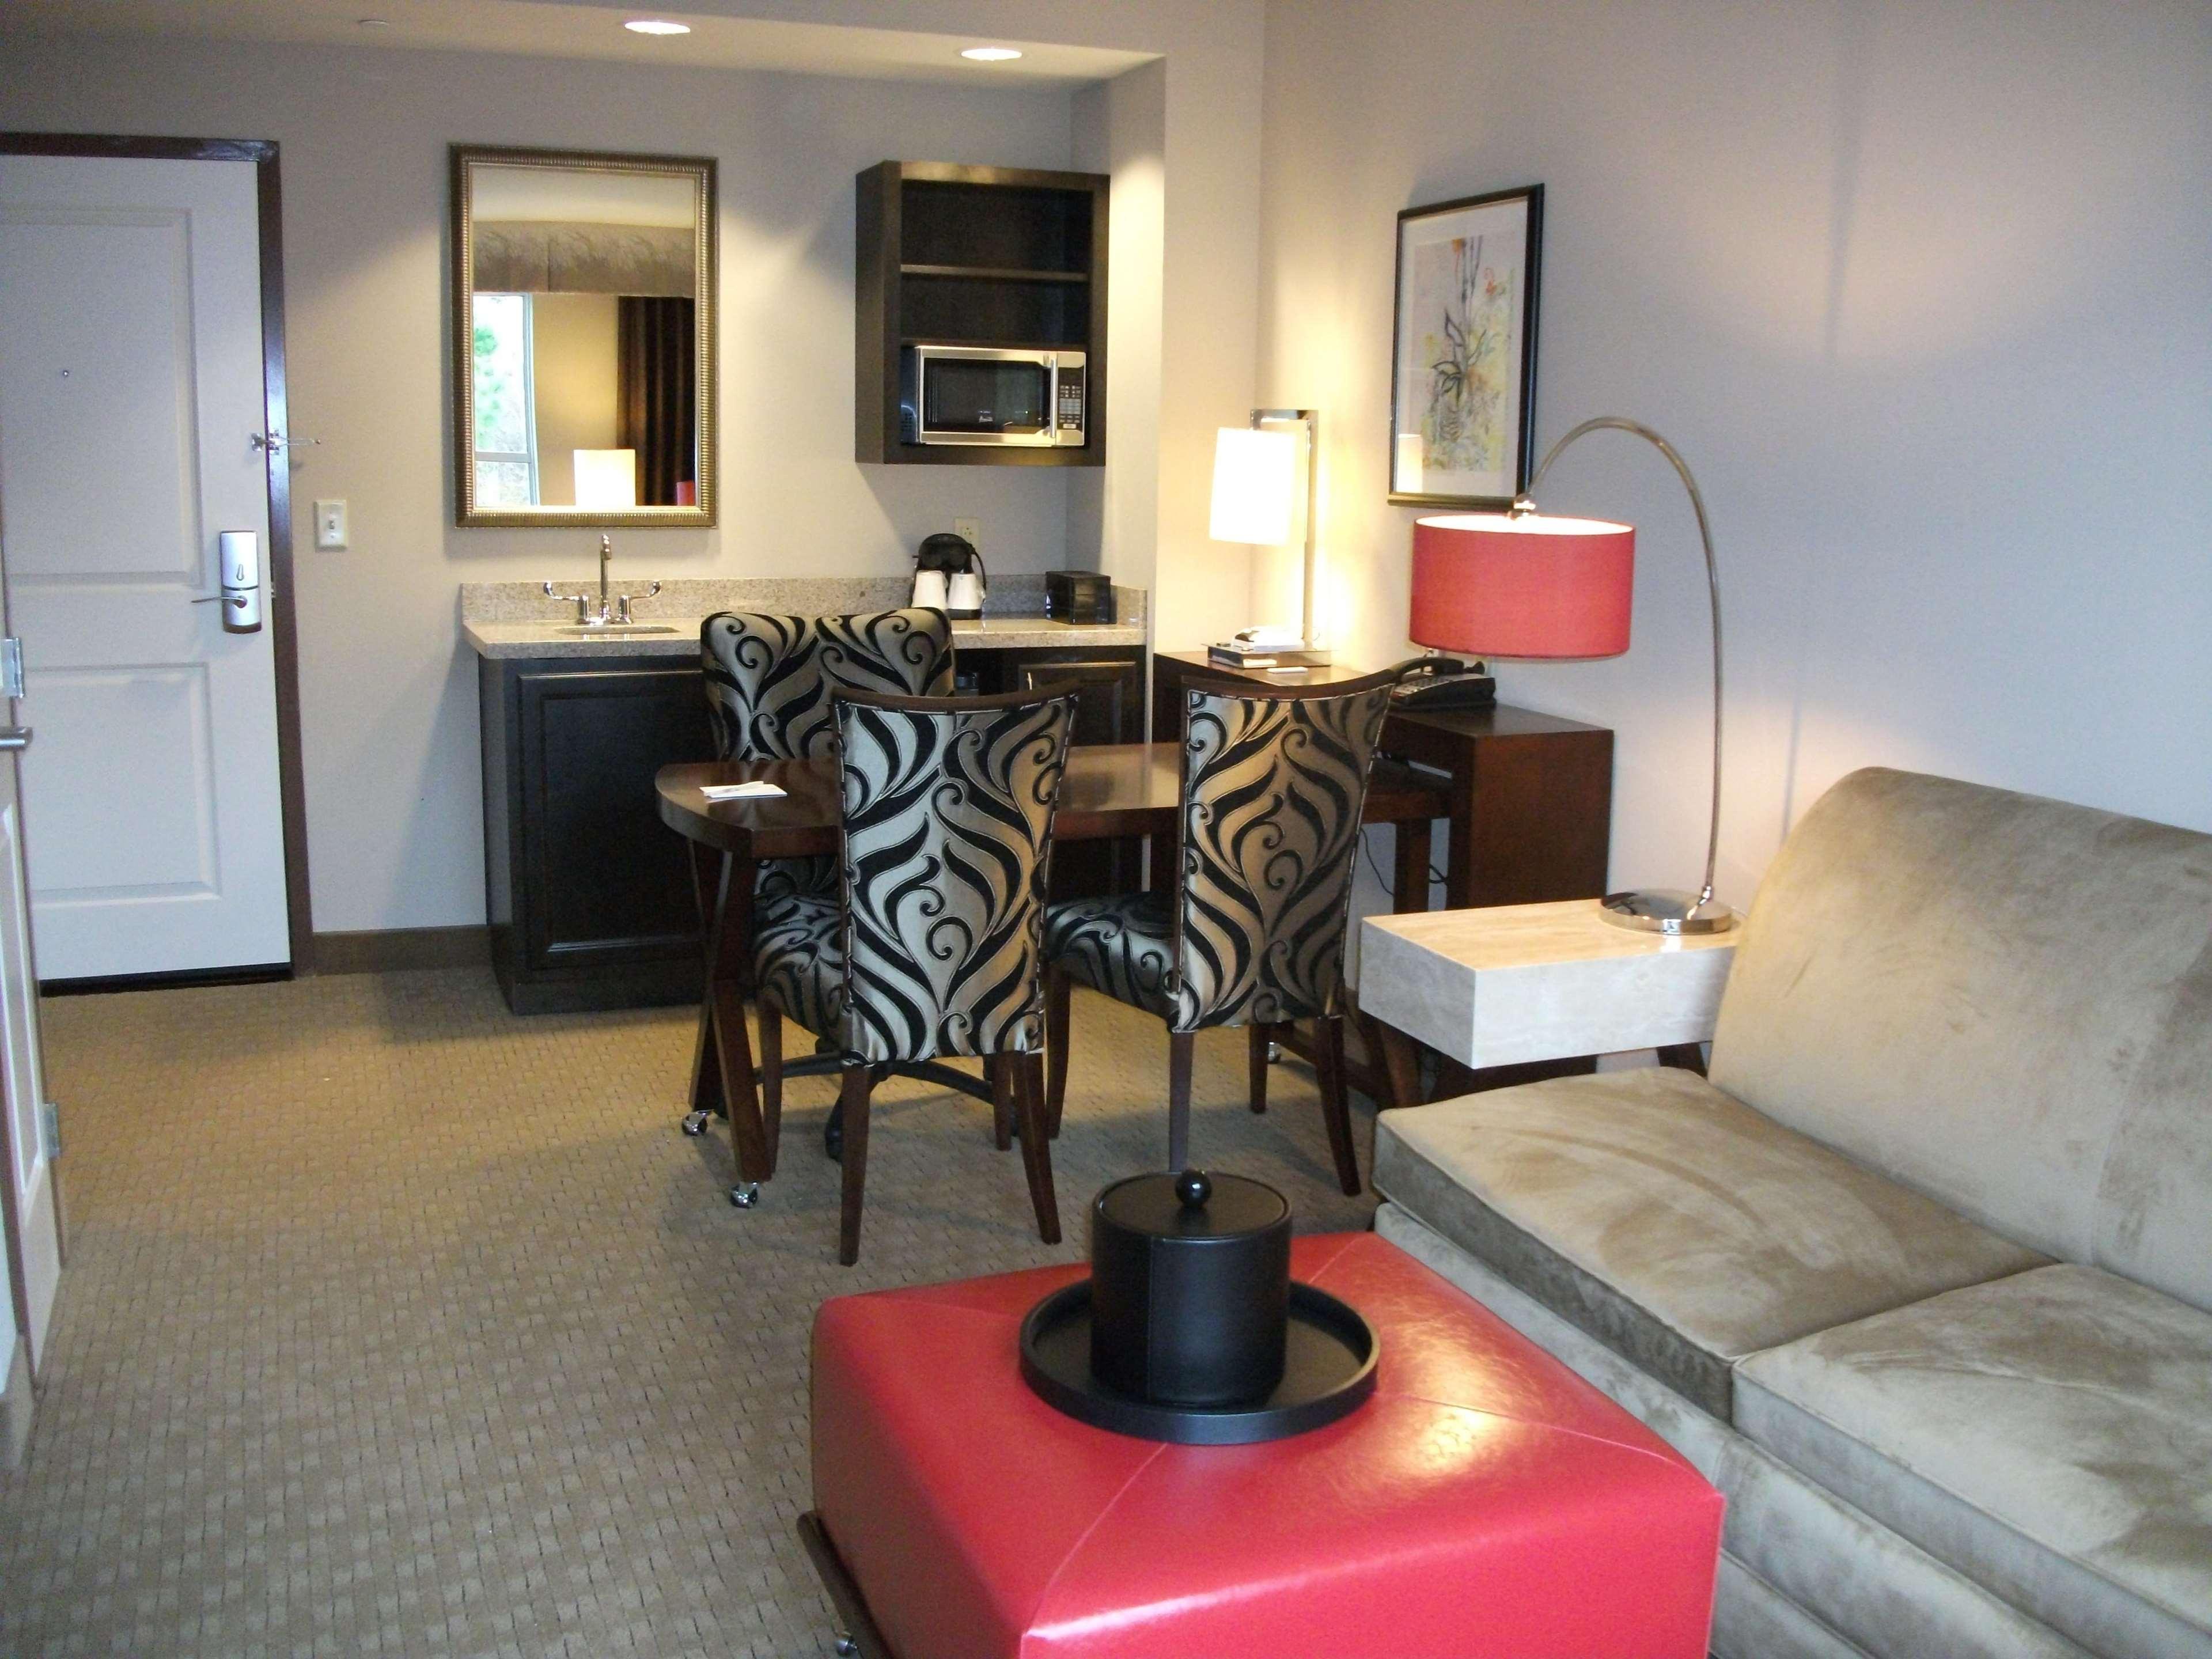 Embassy Suites by Hilton Birmingham Hoover image 33